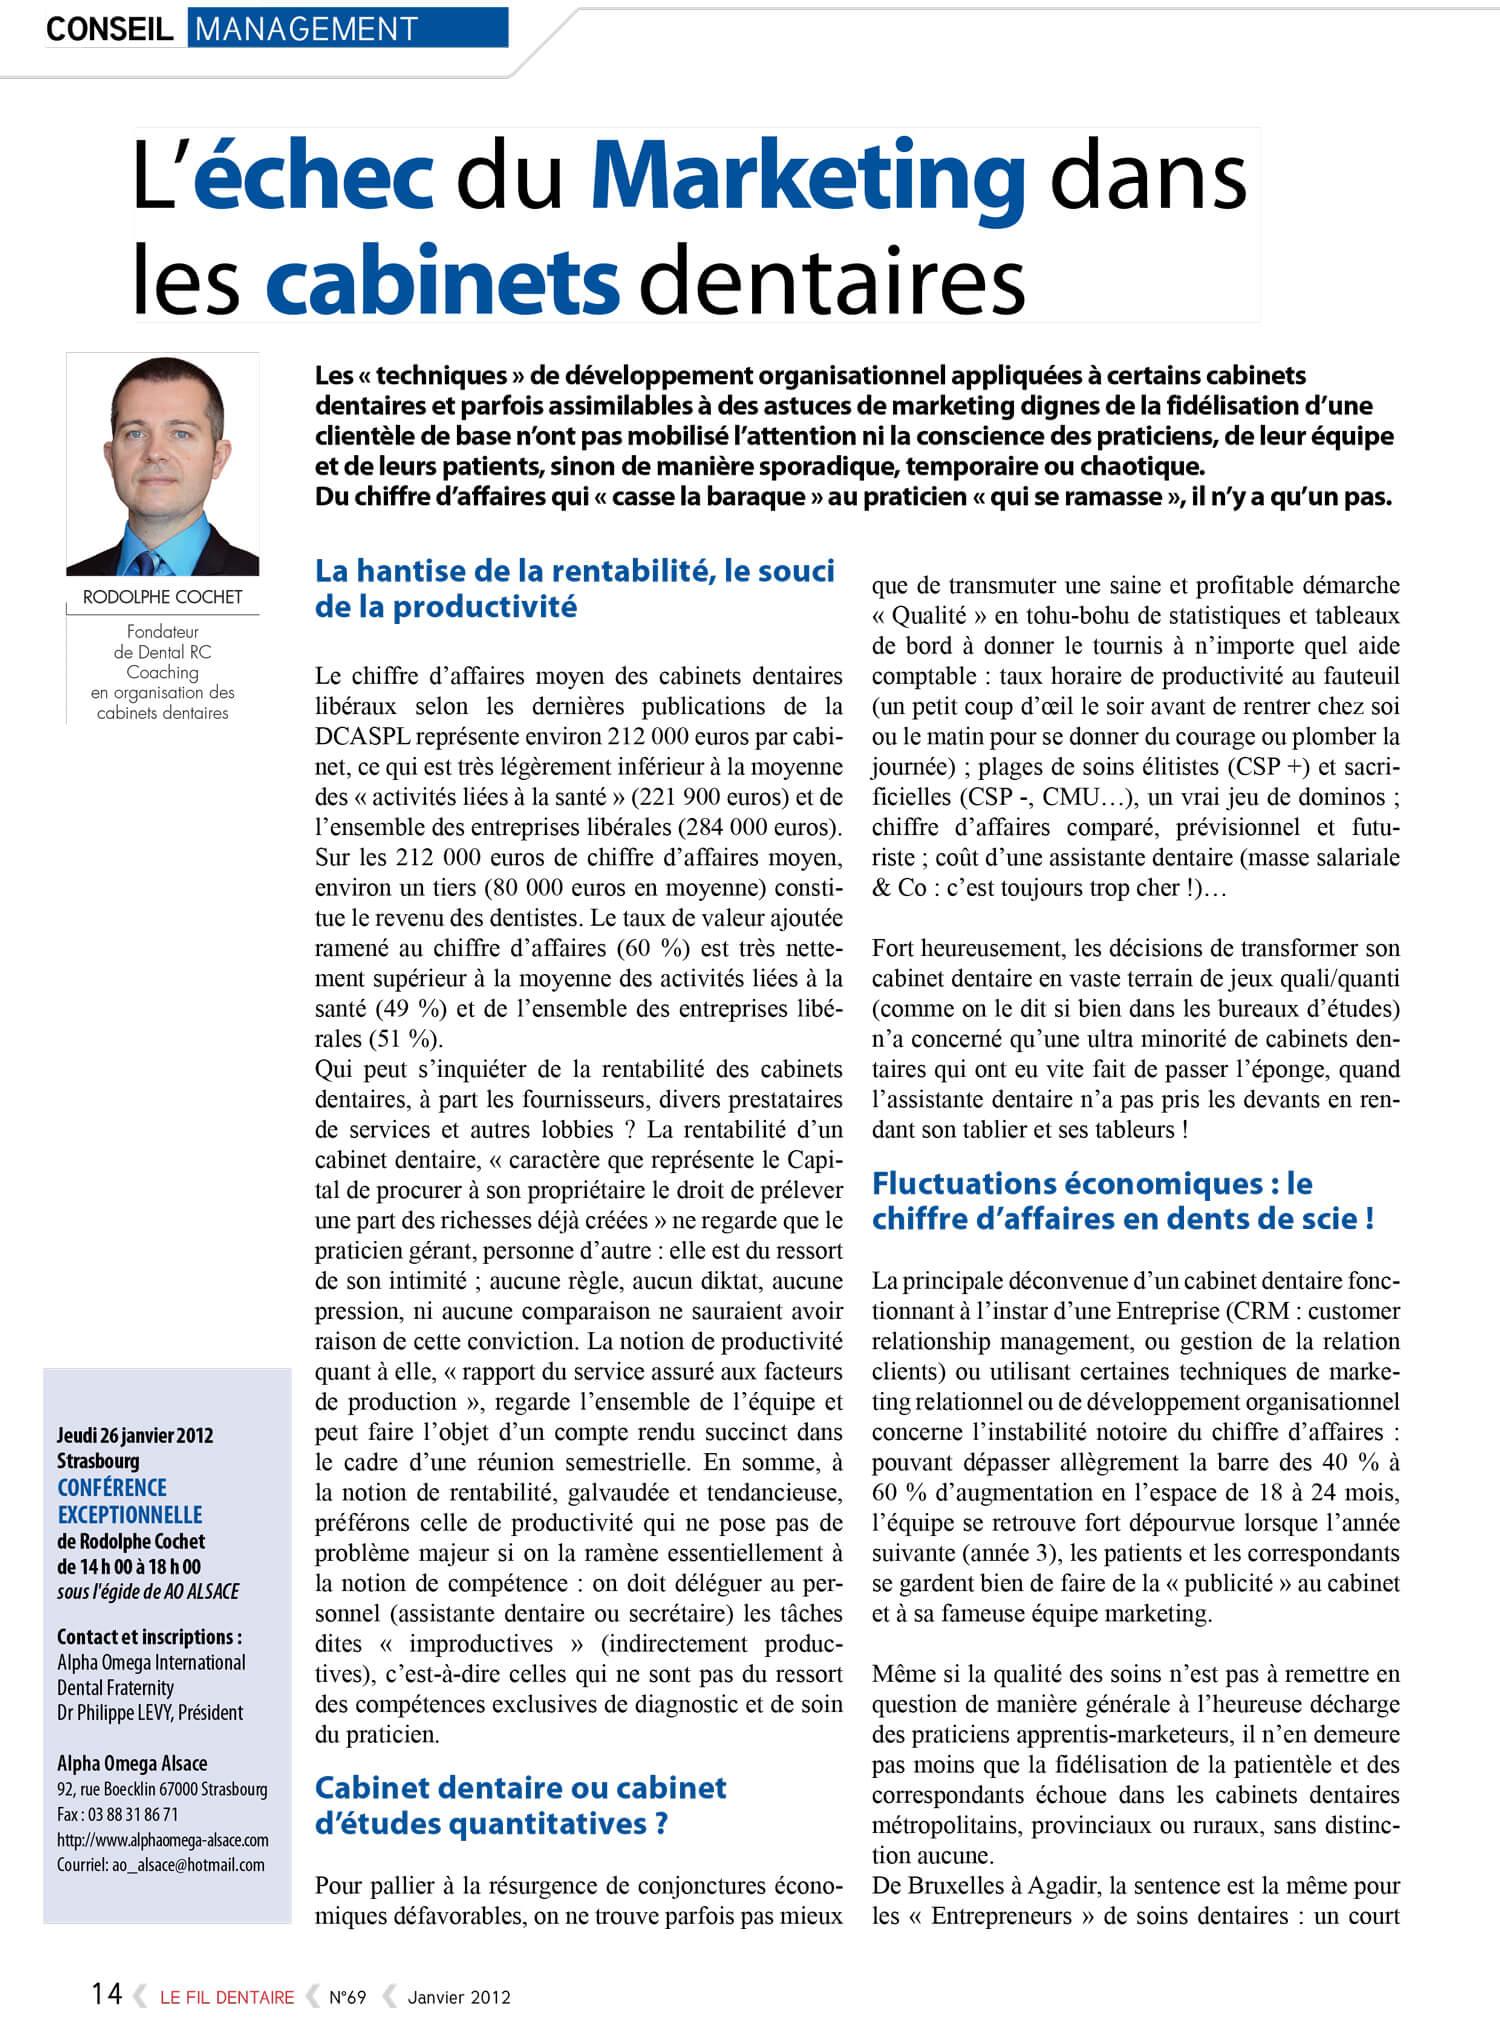 echec-marketing-cabinet-dentaire-management-rodolphe-cochet-le-fil-dentaire.jpg